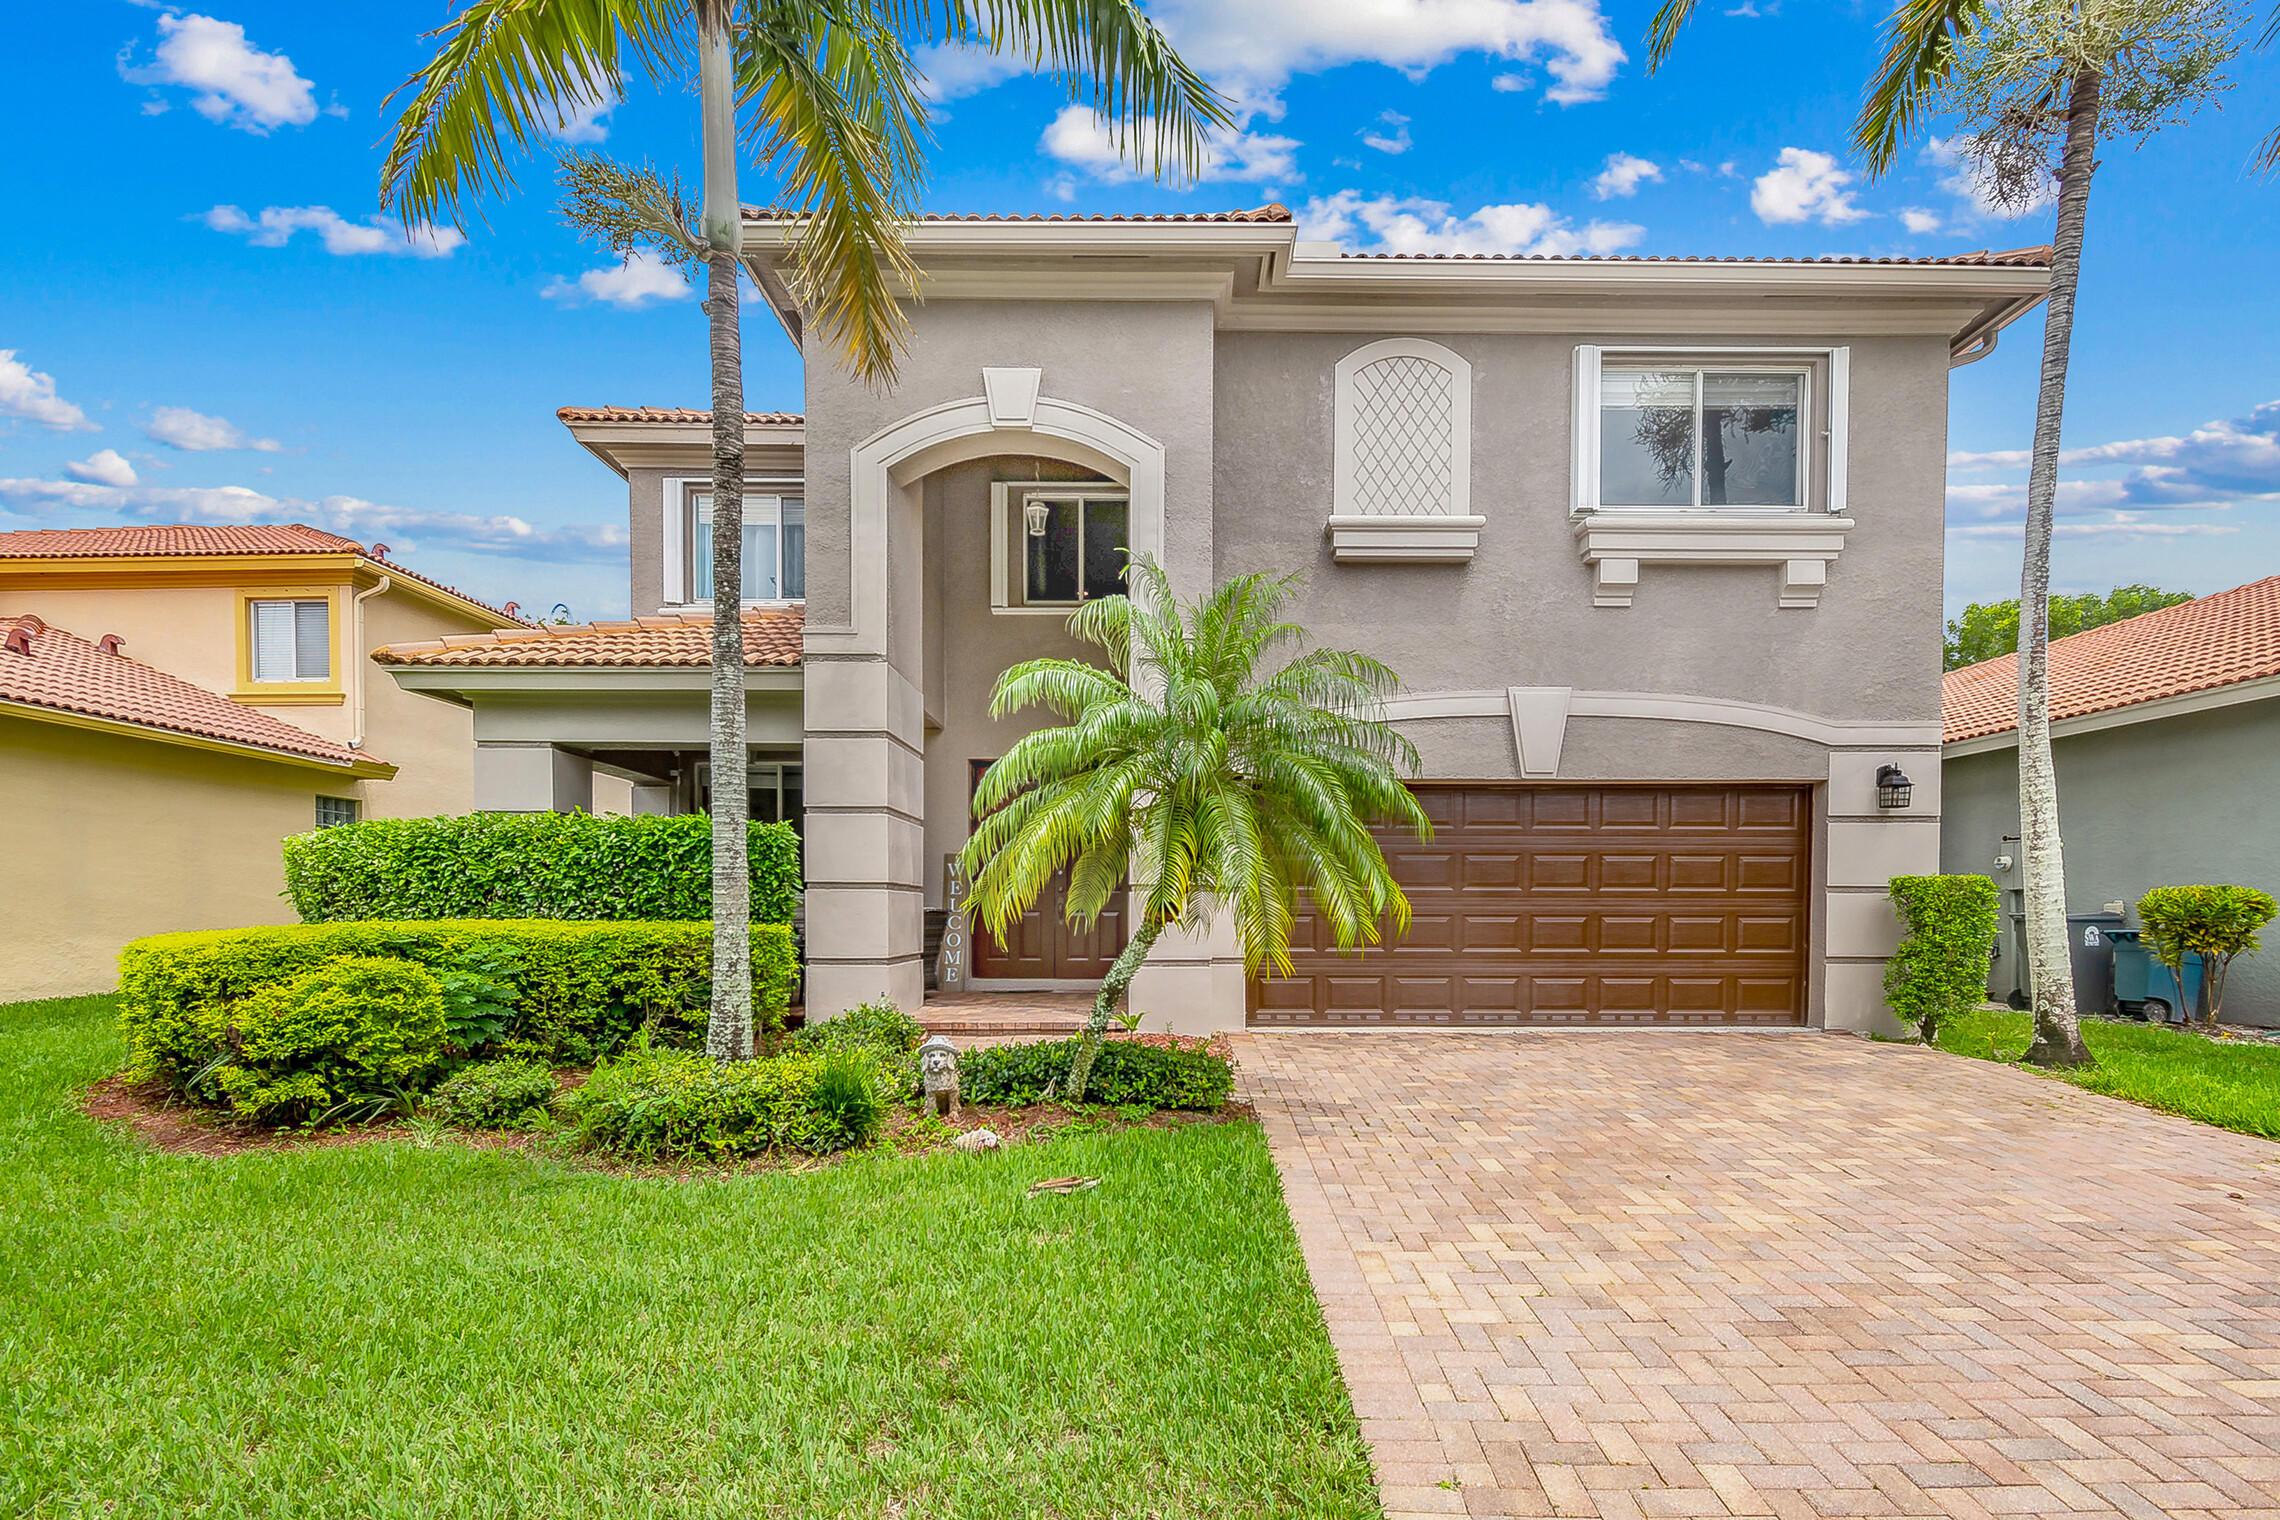 771 Gazetta Way West Palm Beach, FL 33413